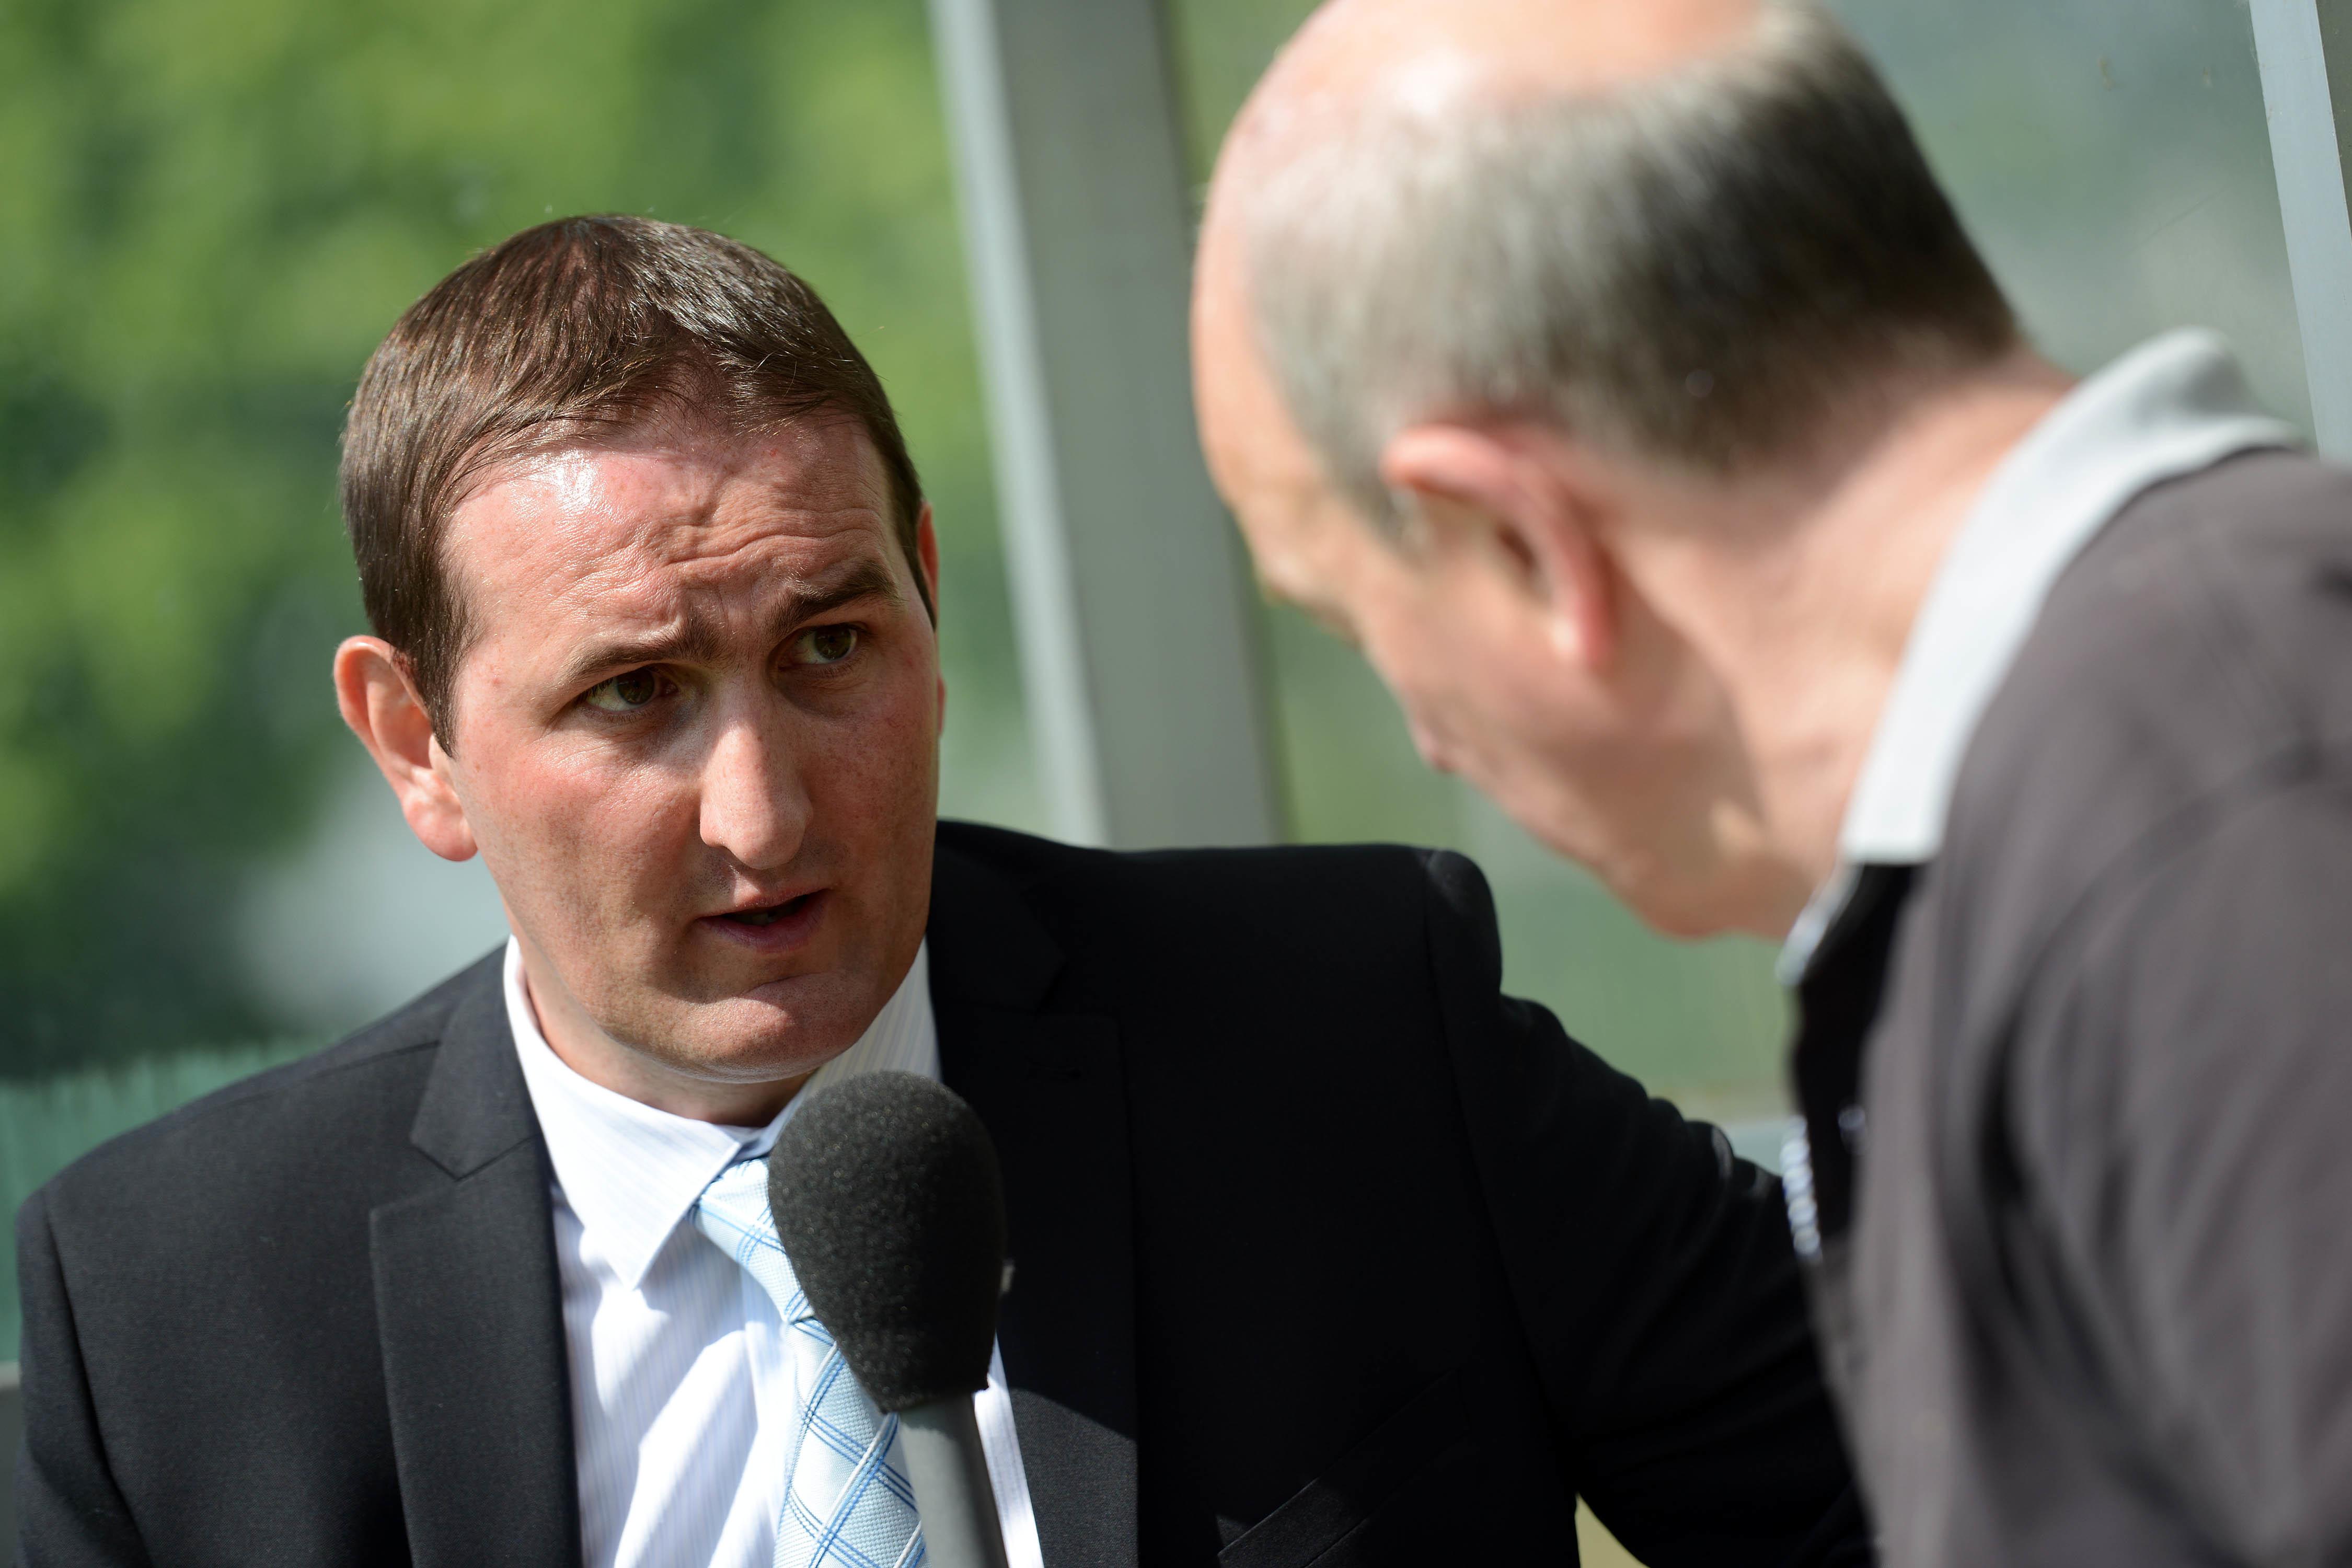 Football - Football League One - Wolverhampton Wanderers head coach Kenny Jackett